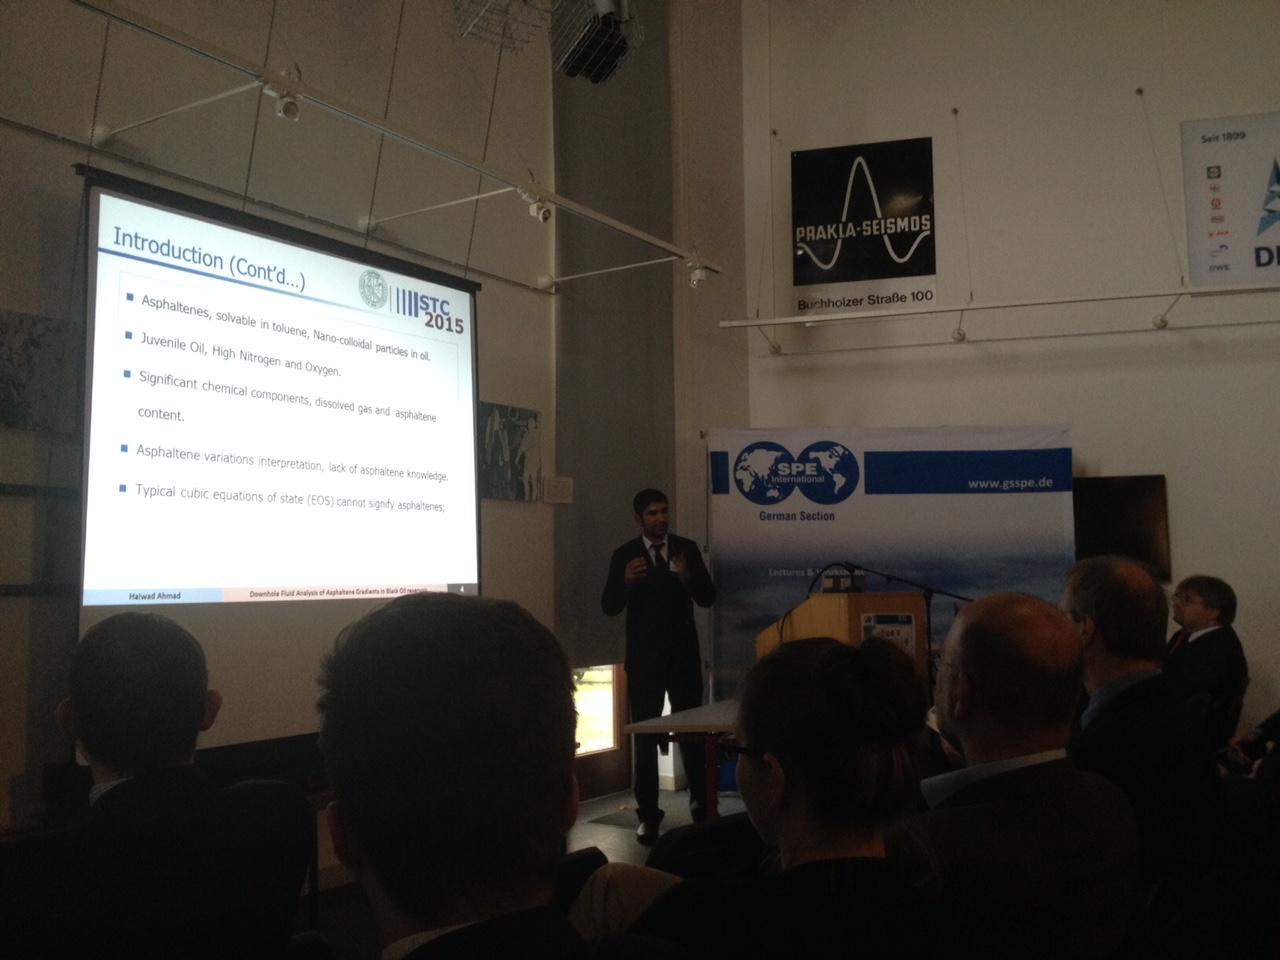 Haiwad Ahmad is presenting about Downhole Fluid Analysis